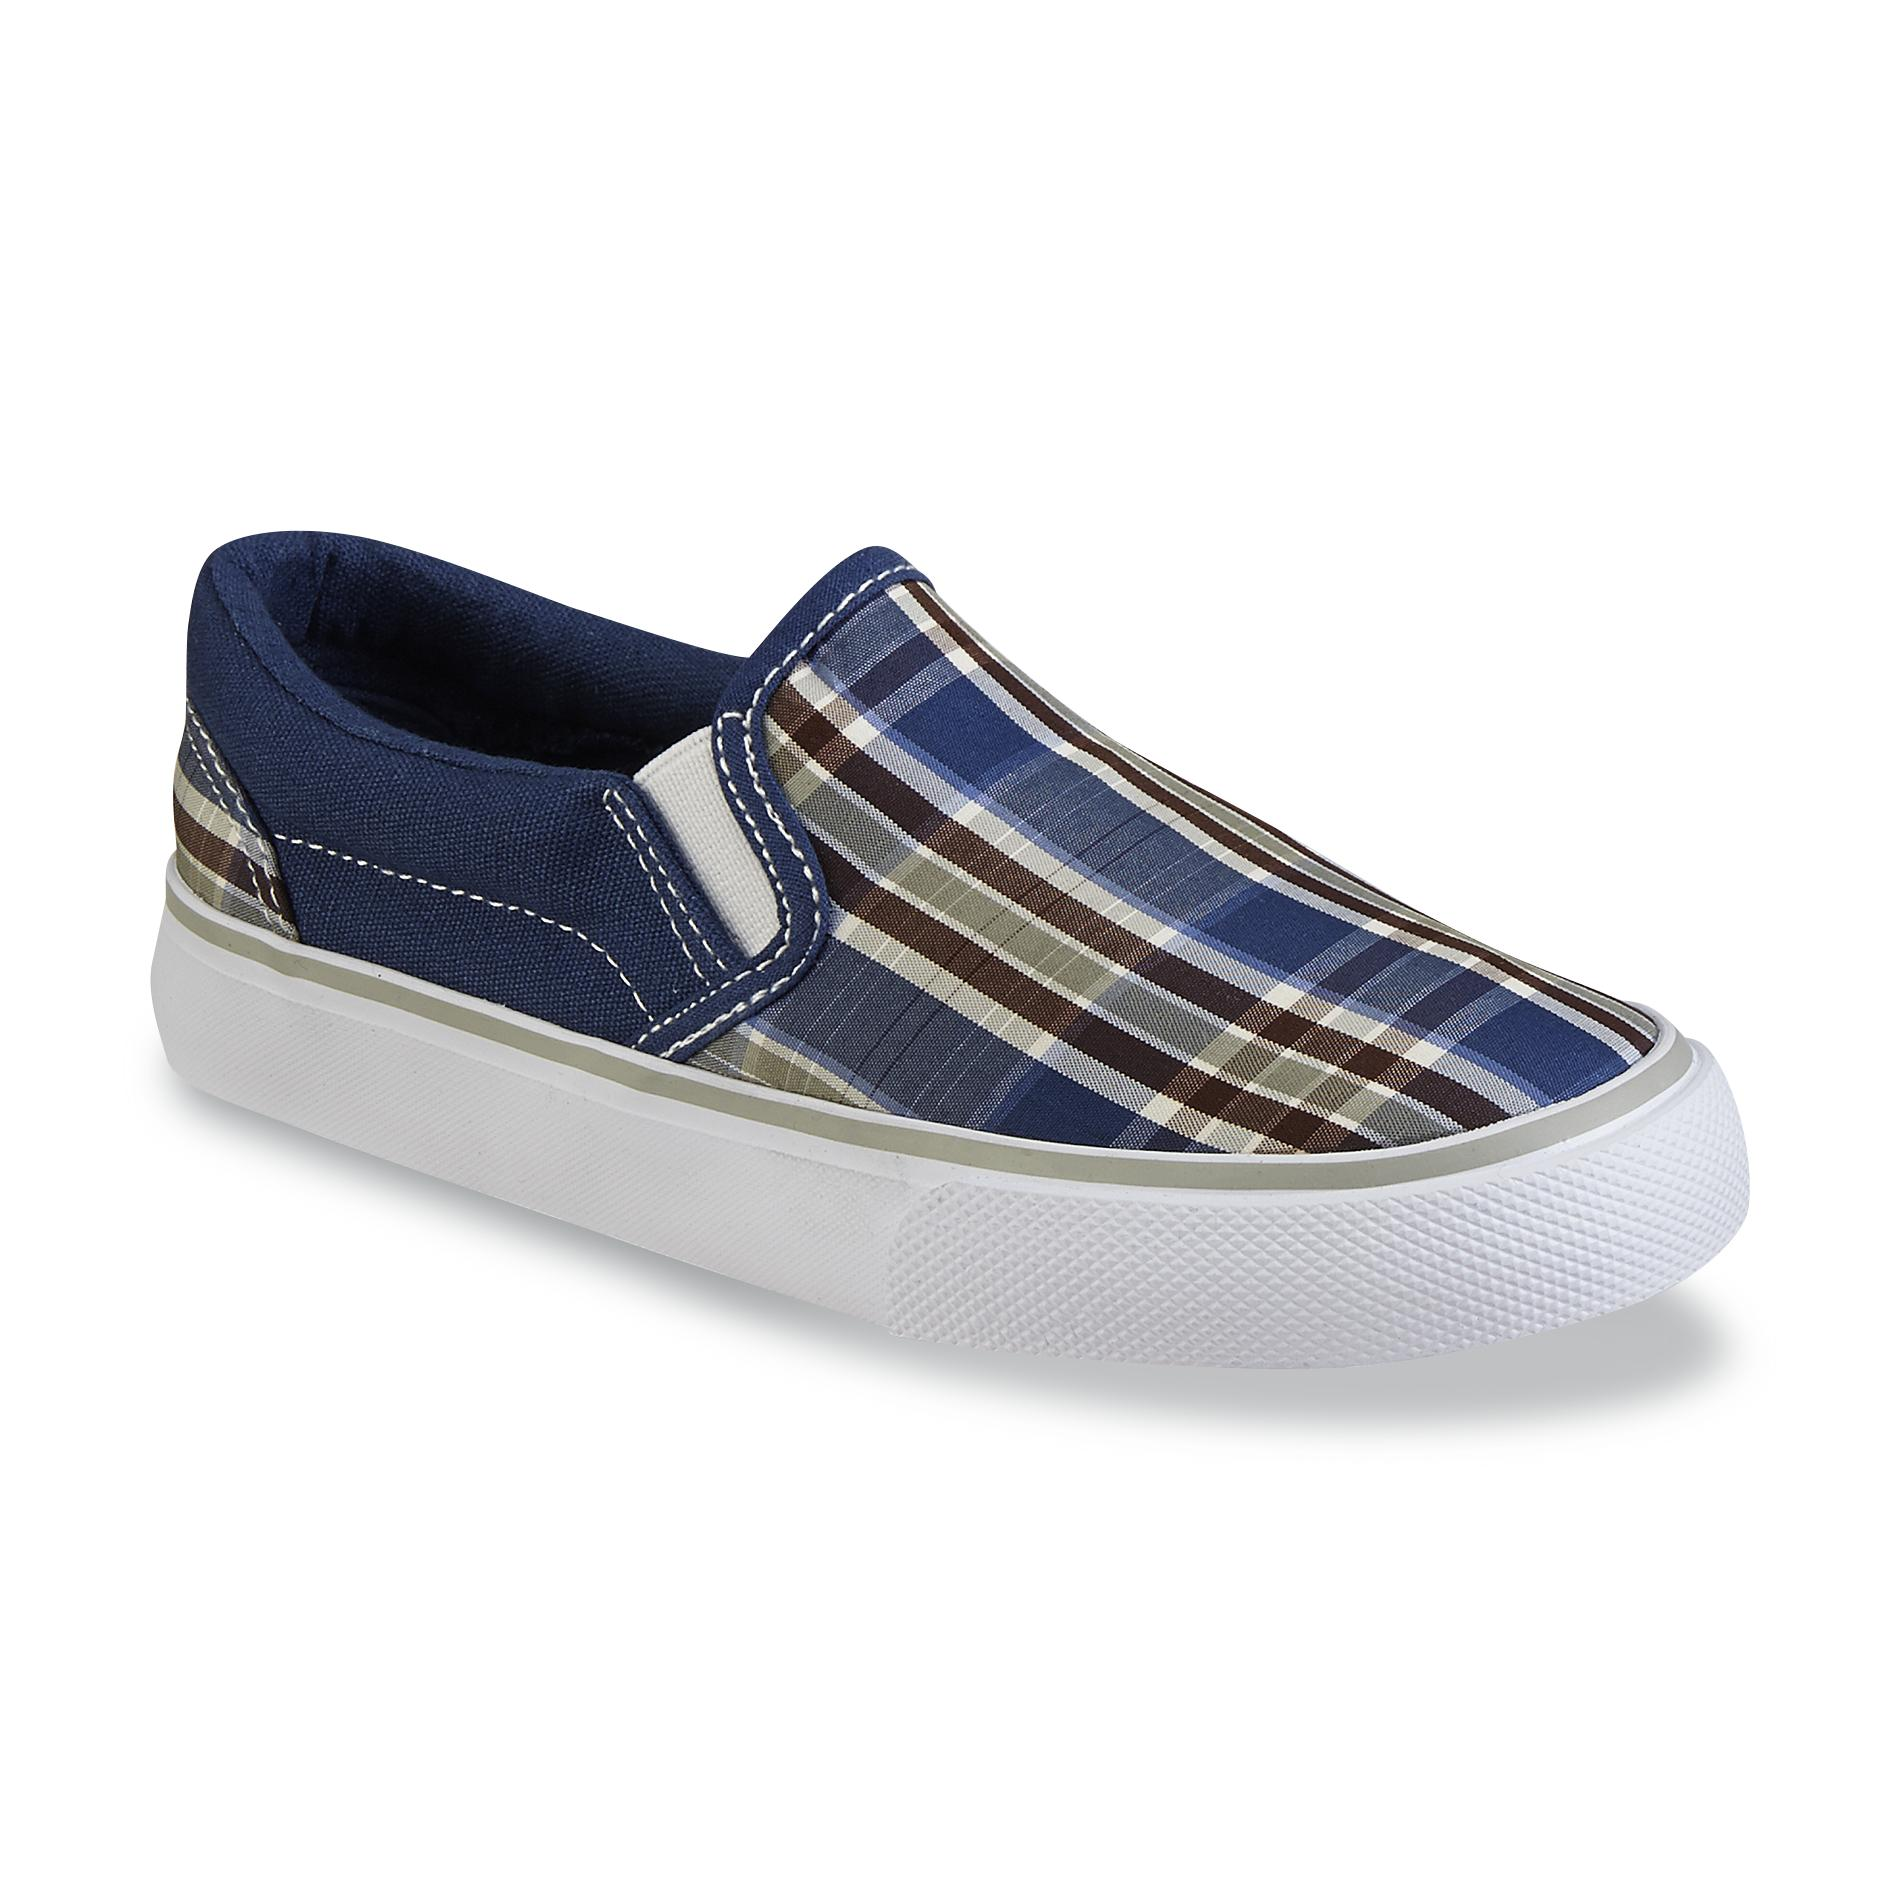 Canyon River Blues Boy's Max Navy/Green/Brown Fabric Slip-On Shoe